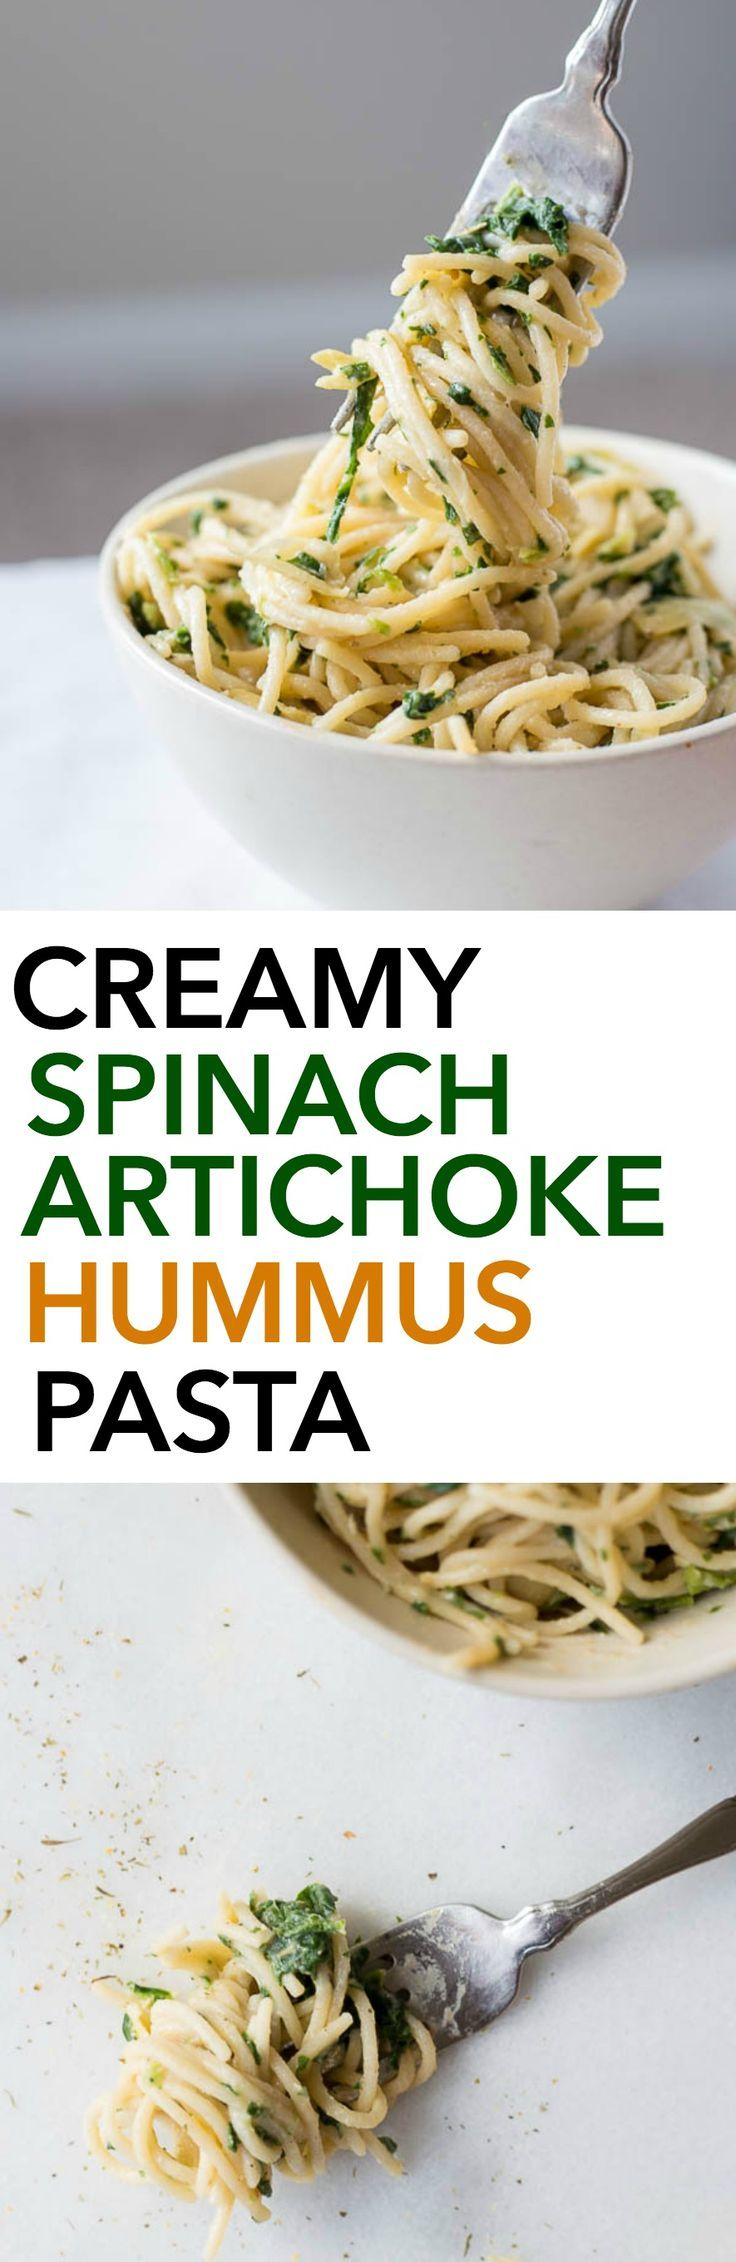 Creamy Spinach Artichoke Hummus Pasta: